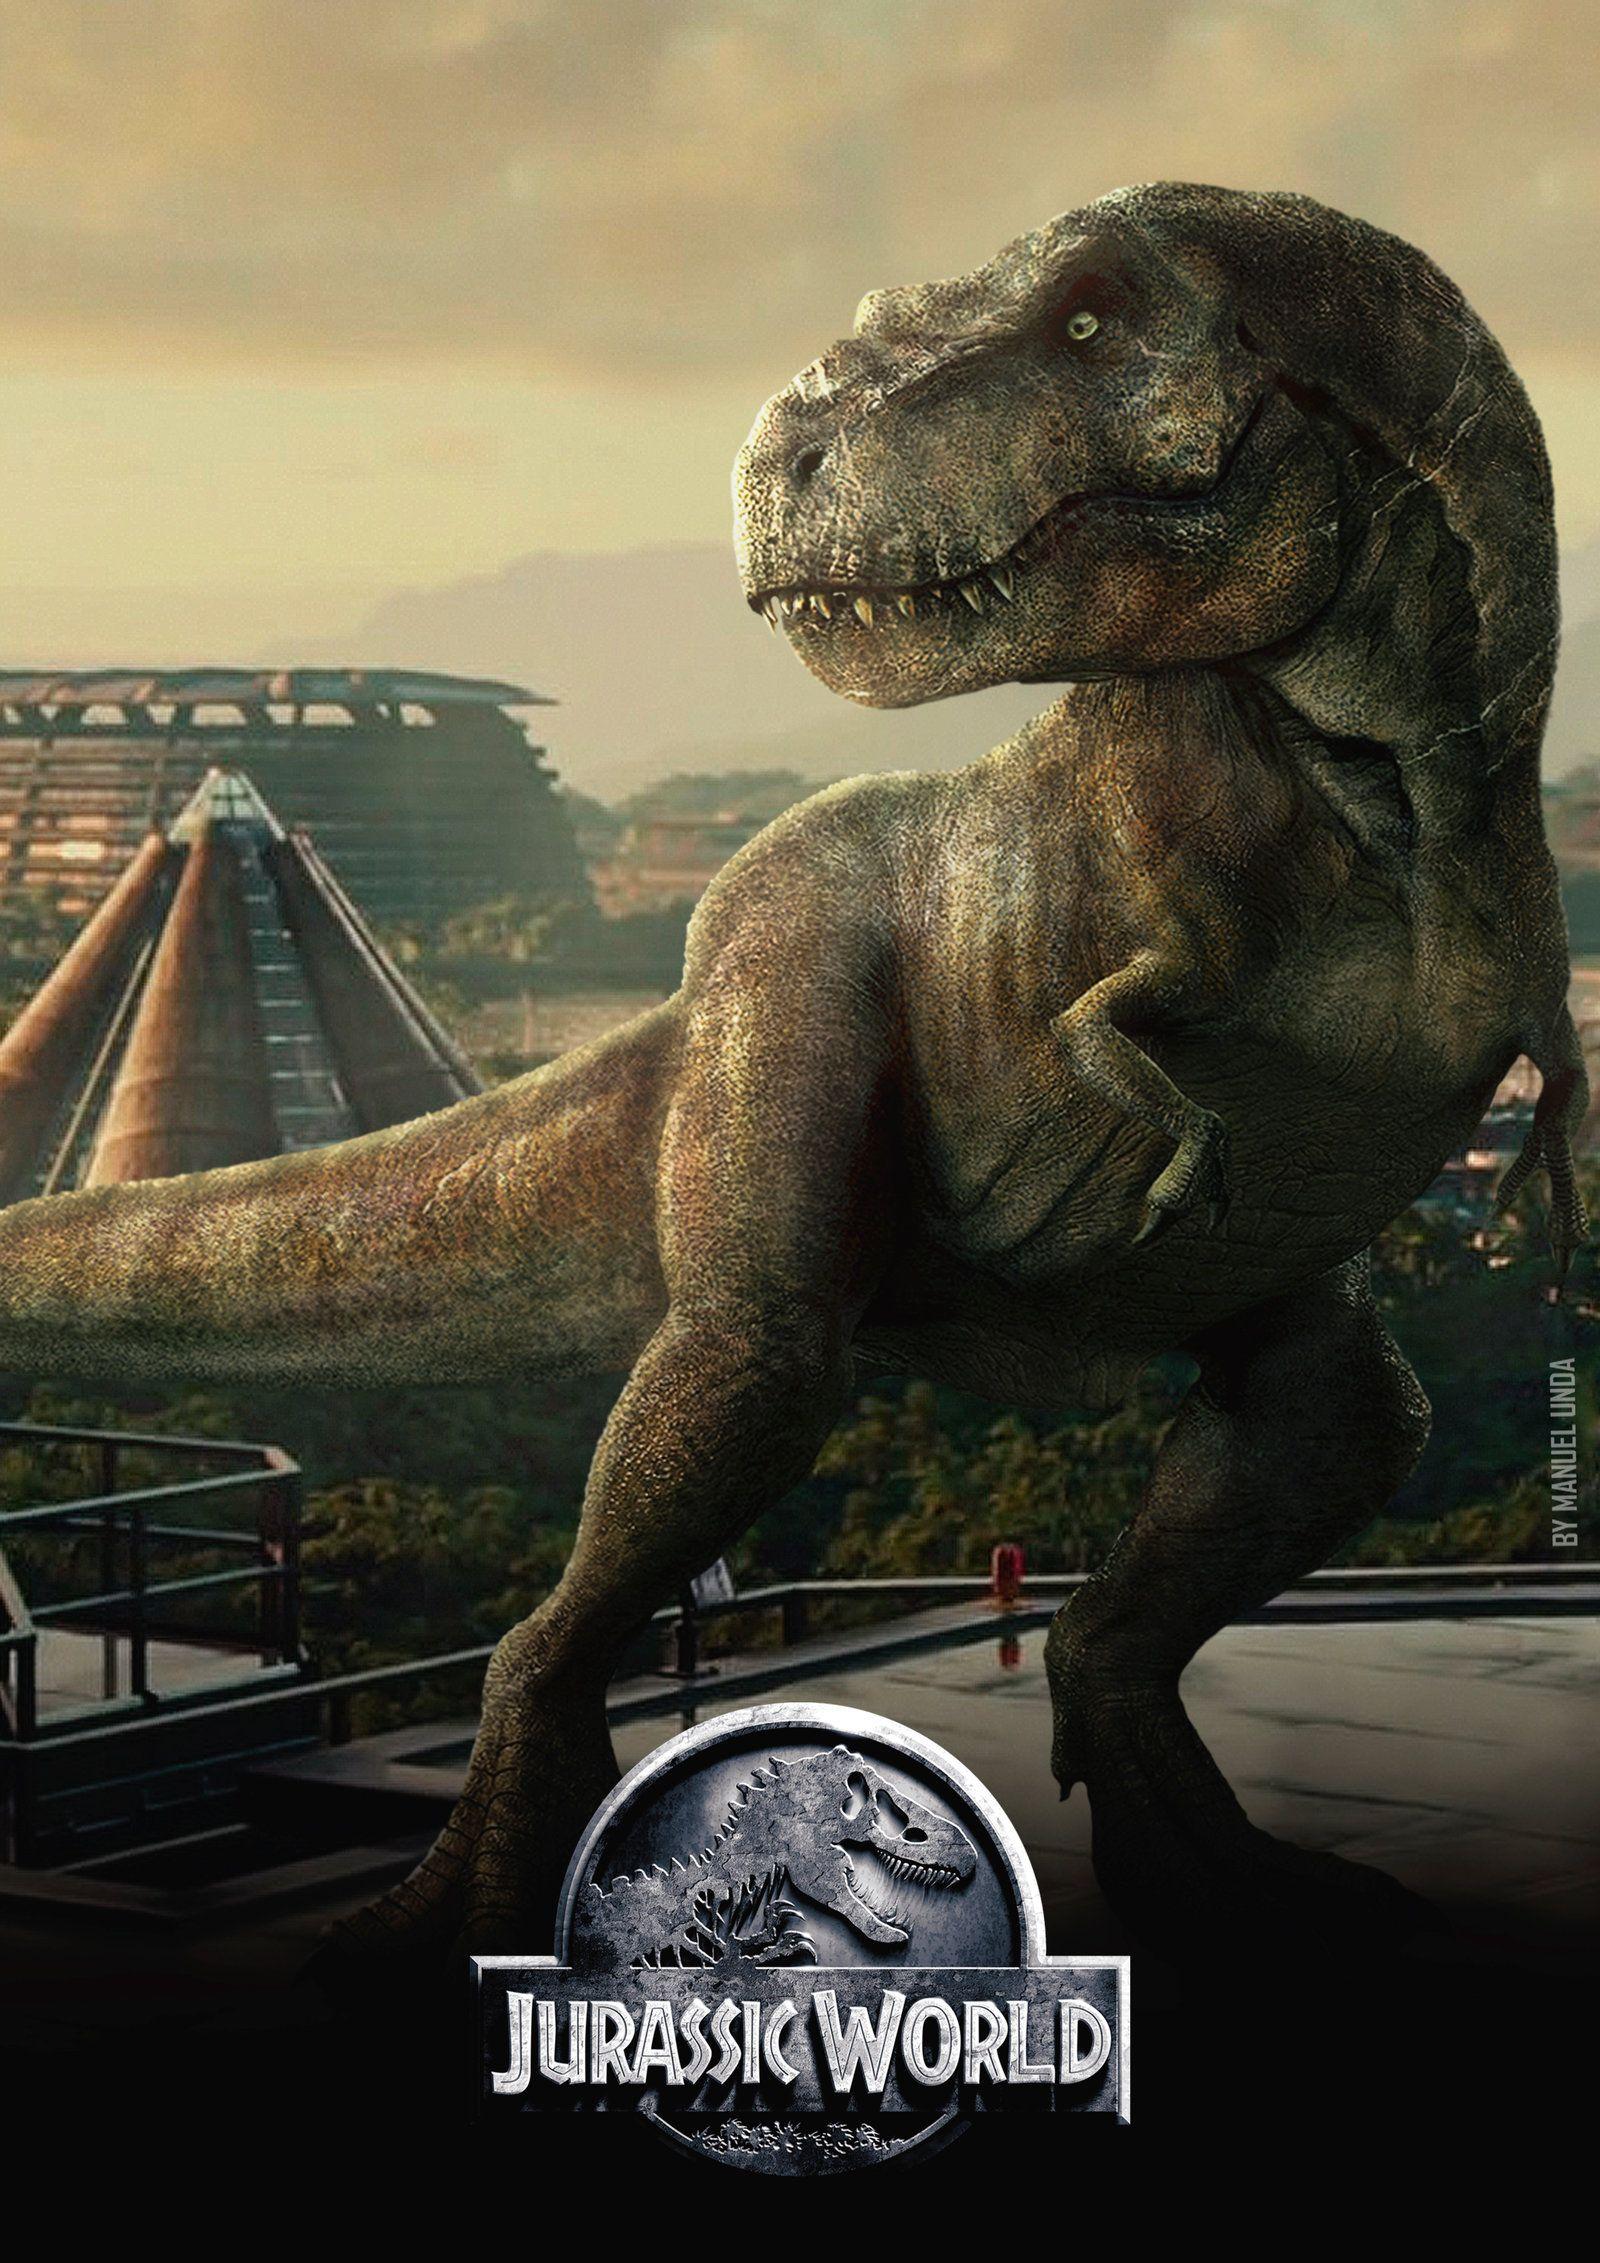 Tyrannosaur, Jurassic World spoiler | T-rex and dinosaurs | Pinterest